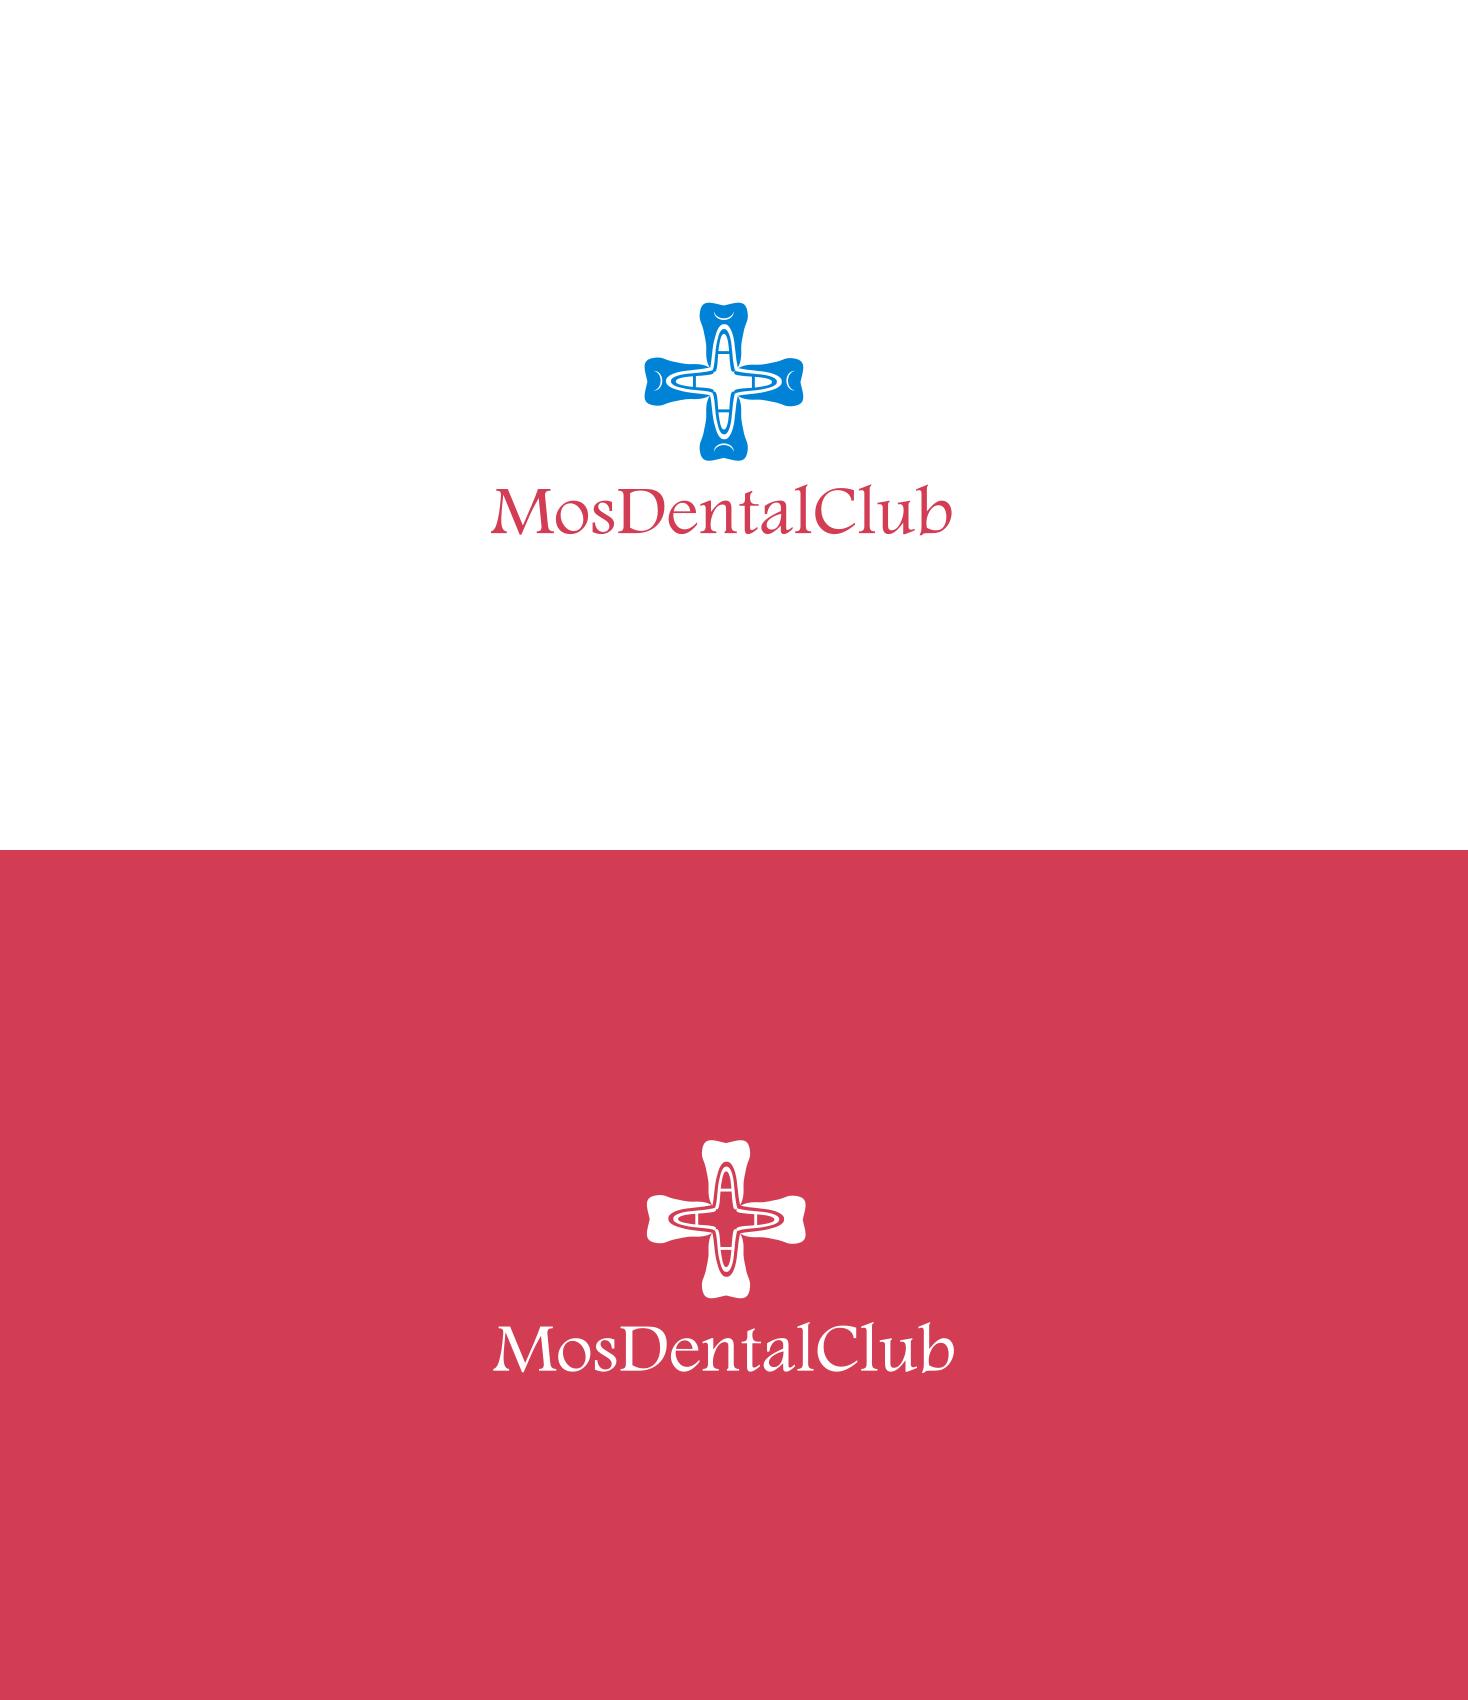 Разработка логотипа стоматологического медицинского центра фото f_8635e4af380e2e80.png